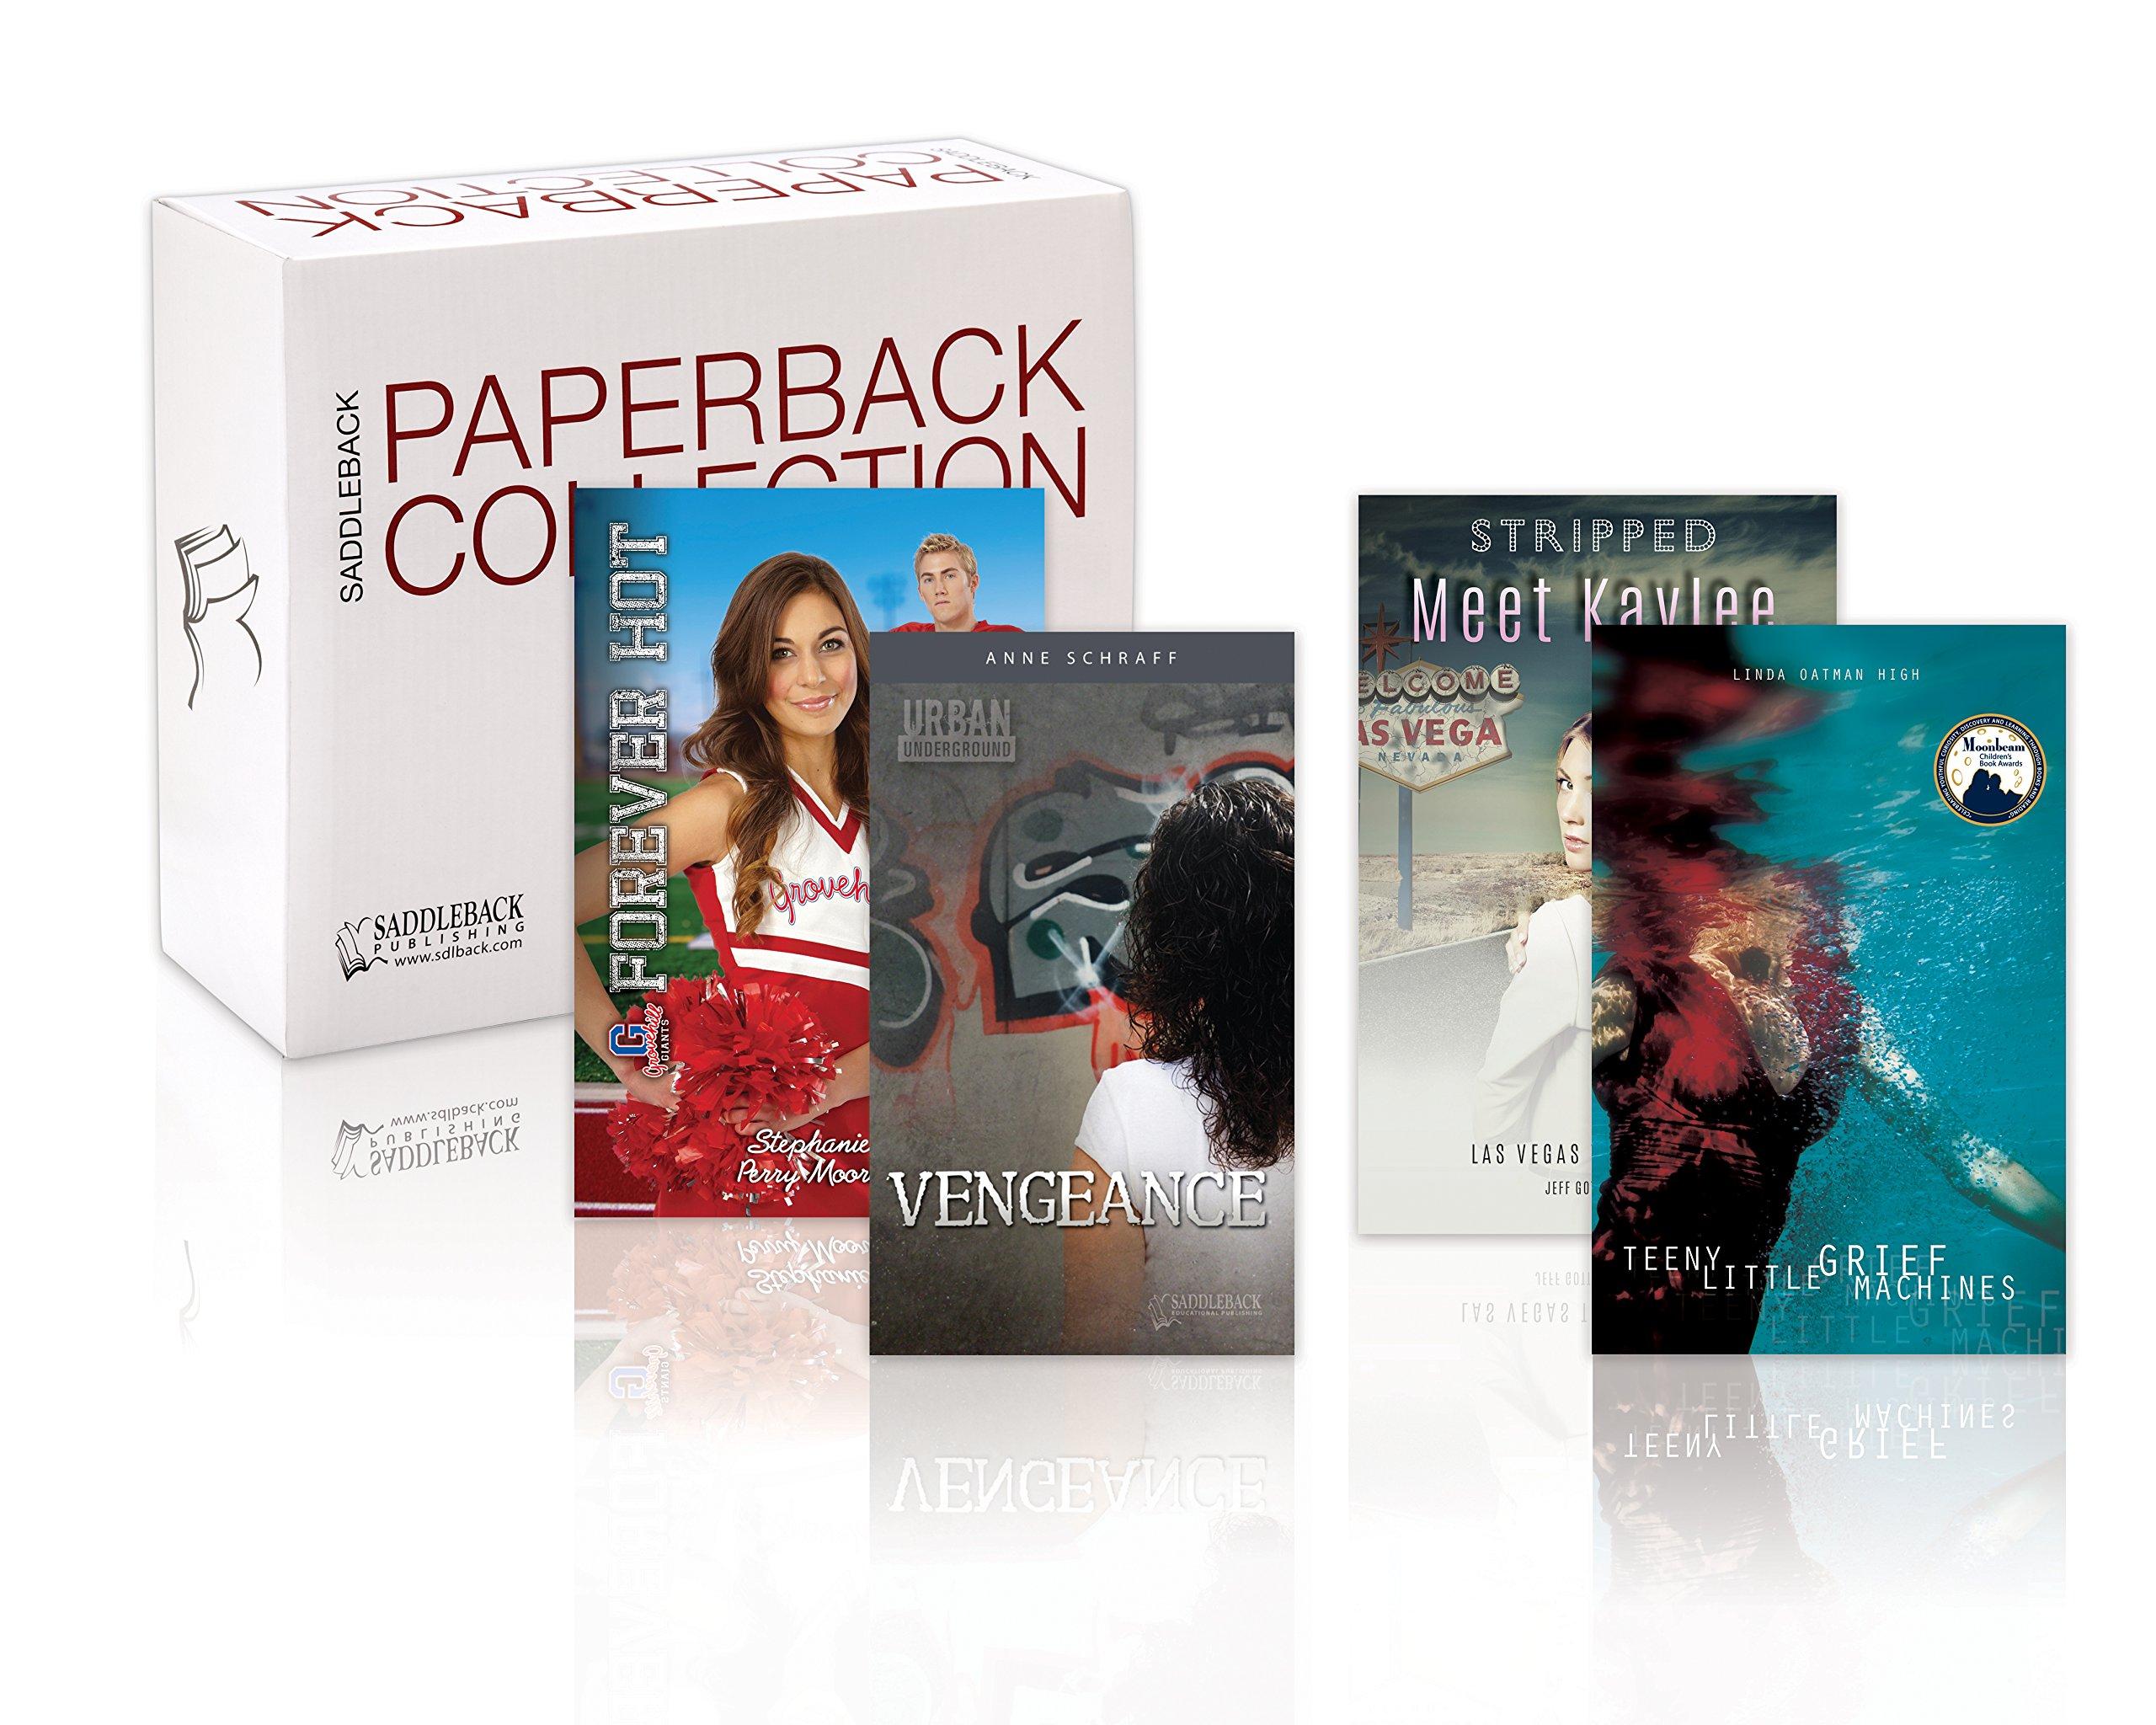 Saddleback Young Adult Moral Focus Set 2 (Range 490L to 790L) Large Box (Leveled Paperback Collections) (Saddleback Paperback Collection) pdf